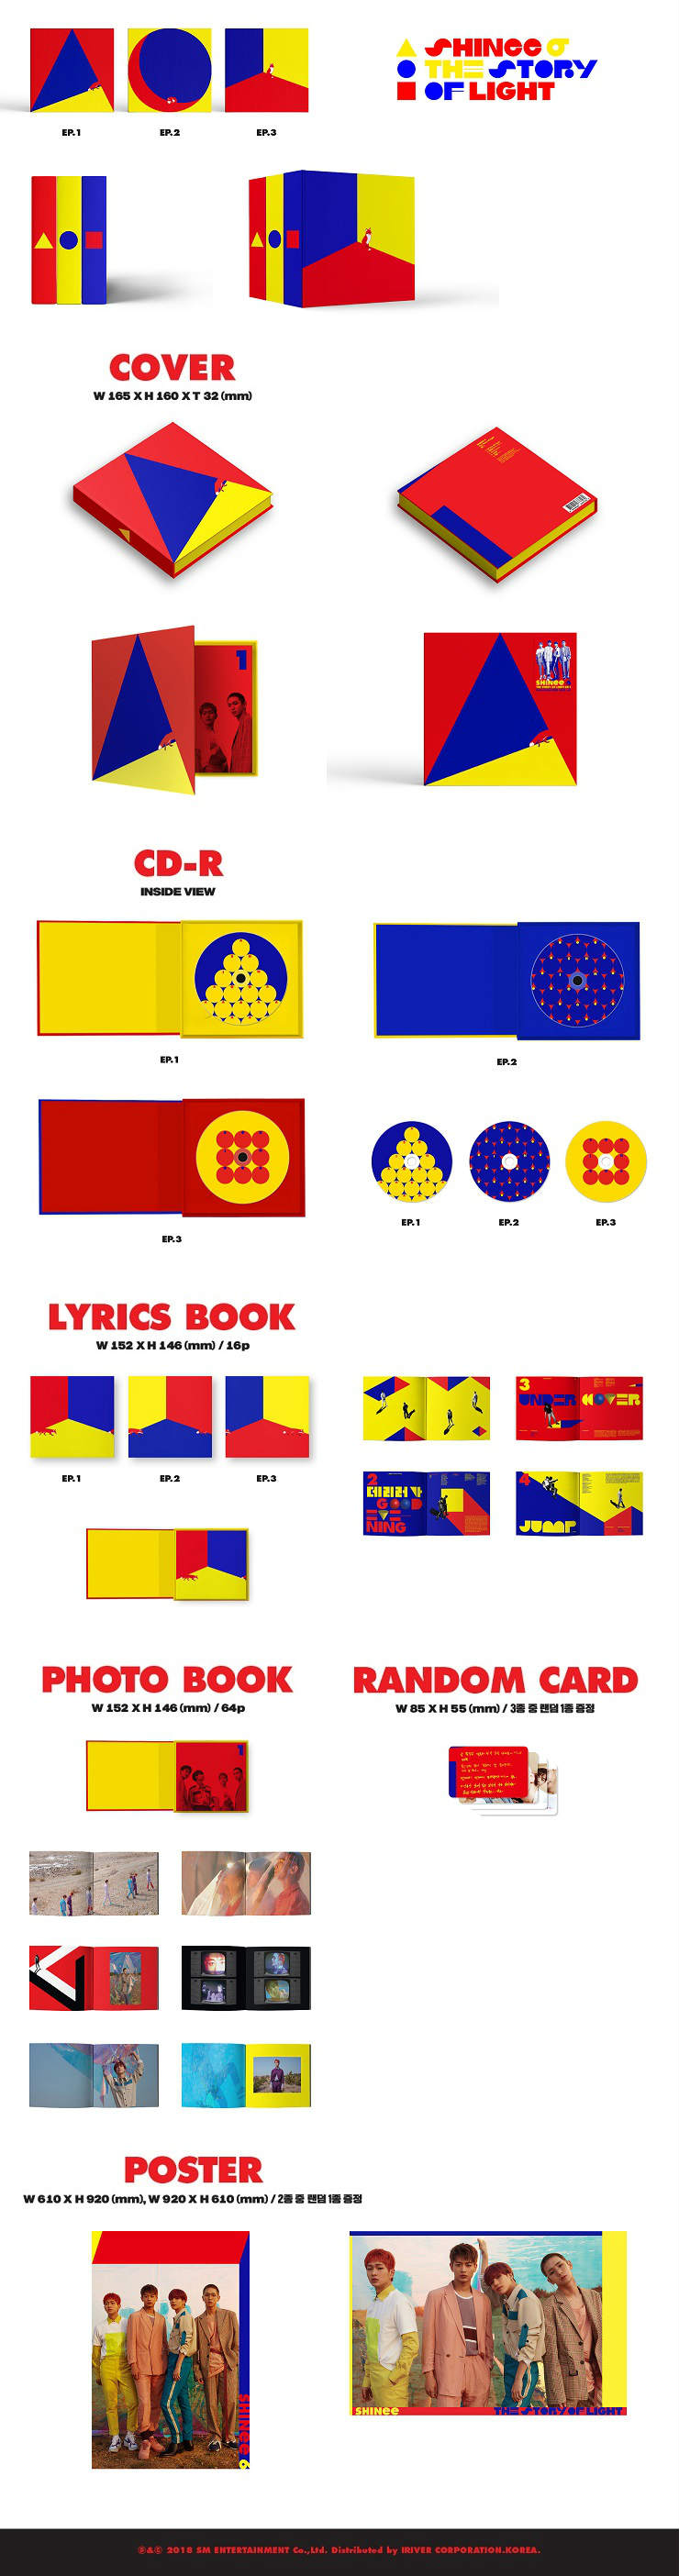 SHINEE - THE STORY OF LIGHT EP 1 | MUSIC KOREA